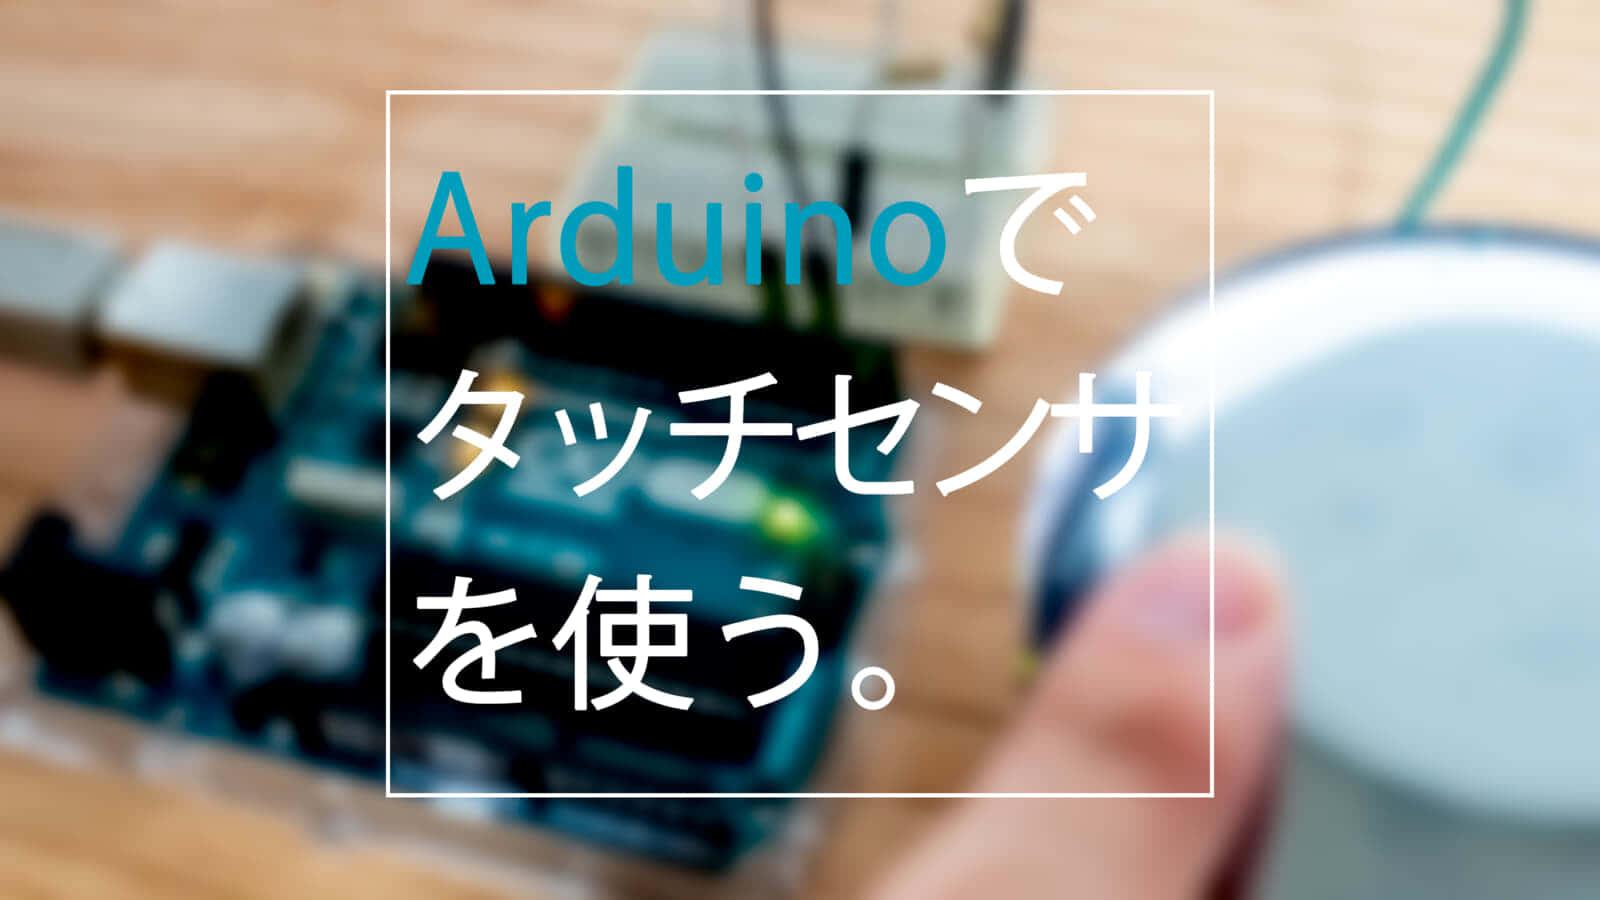 Arduinoでタッチセンサ(静電容量ライブラリ)を使う方法、スイッチレスで外部入力